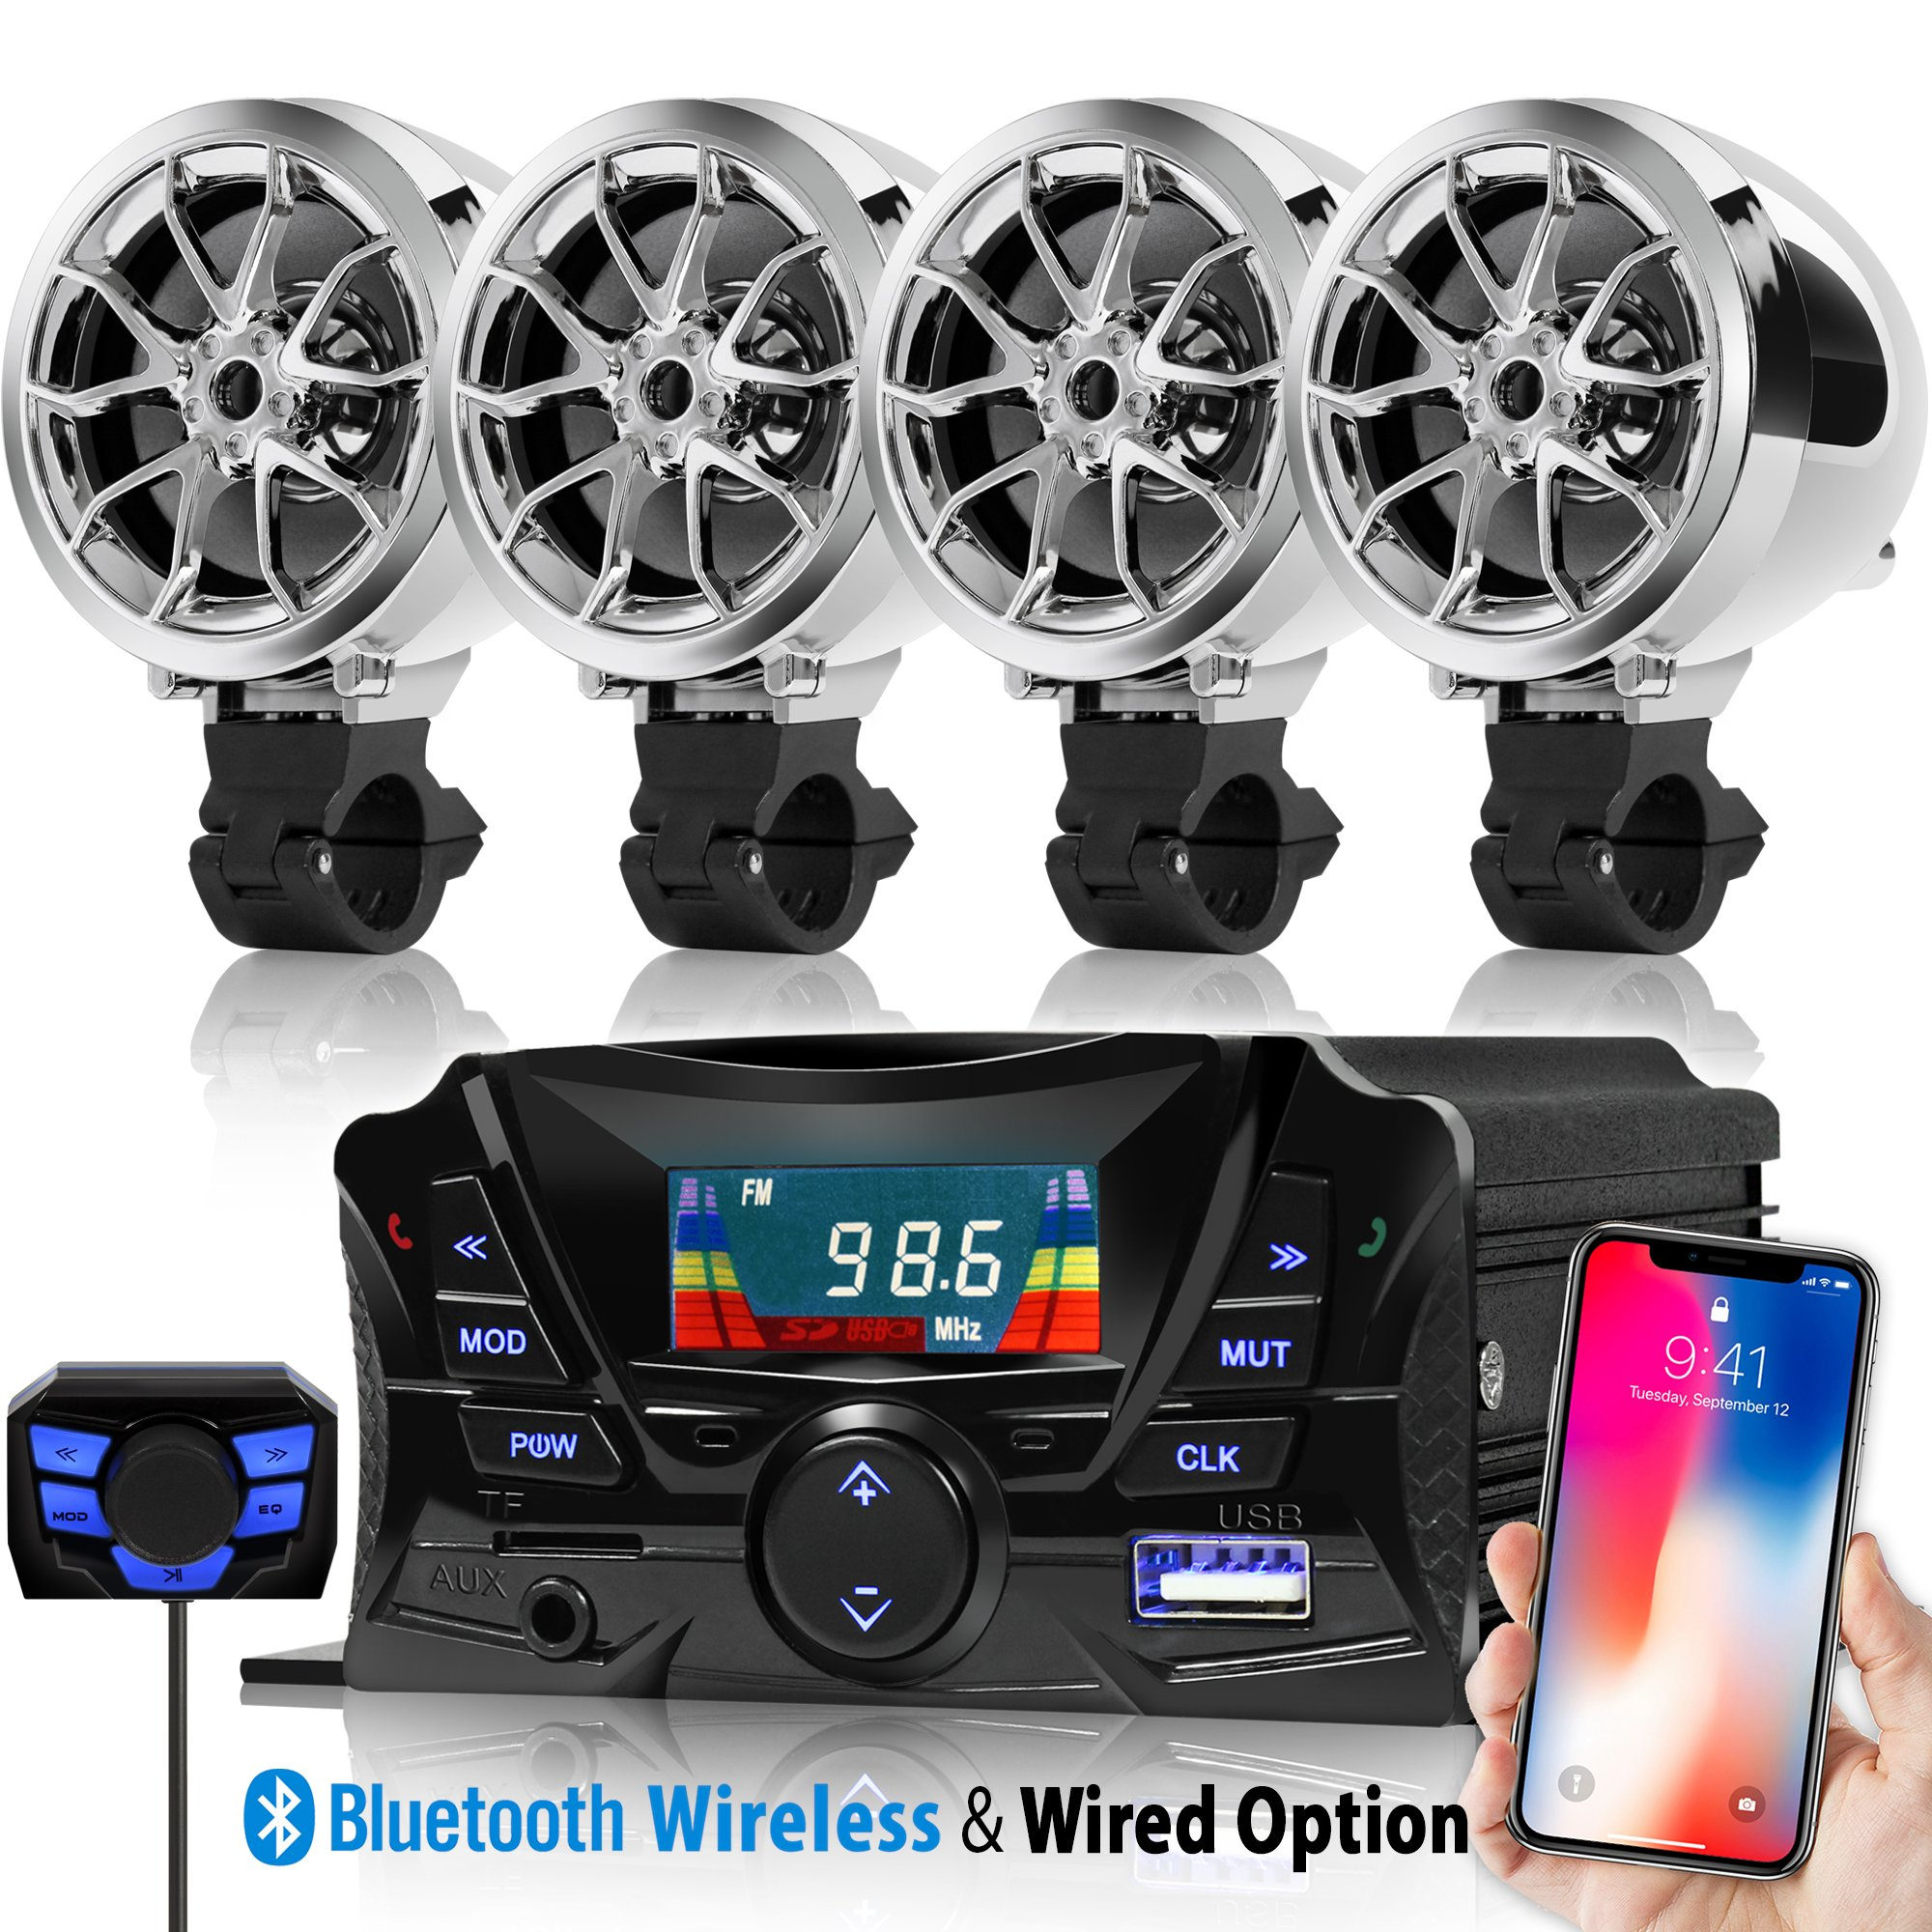 GoldenHawk USA 3'' Motorcycle Waterproof Bluetooth Wireless Speaker 7/8-1 in. Handlebar Mount MP3 Music Player Sound Audio Stereo Amplifier System ATV UTV w/3.5mm AUX IN, USB 2.0, micro SD, FM Radio